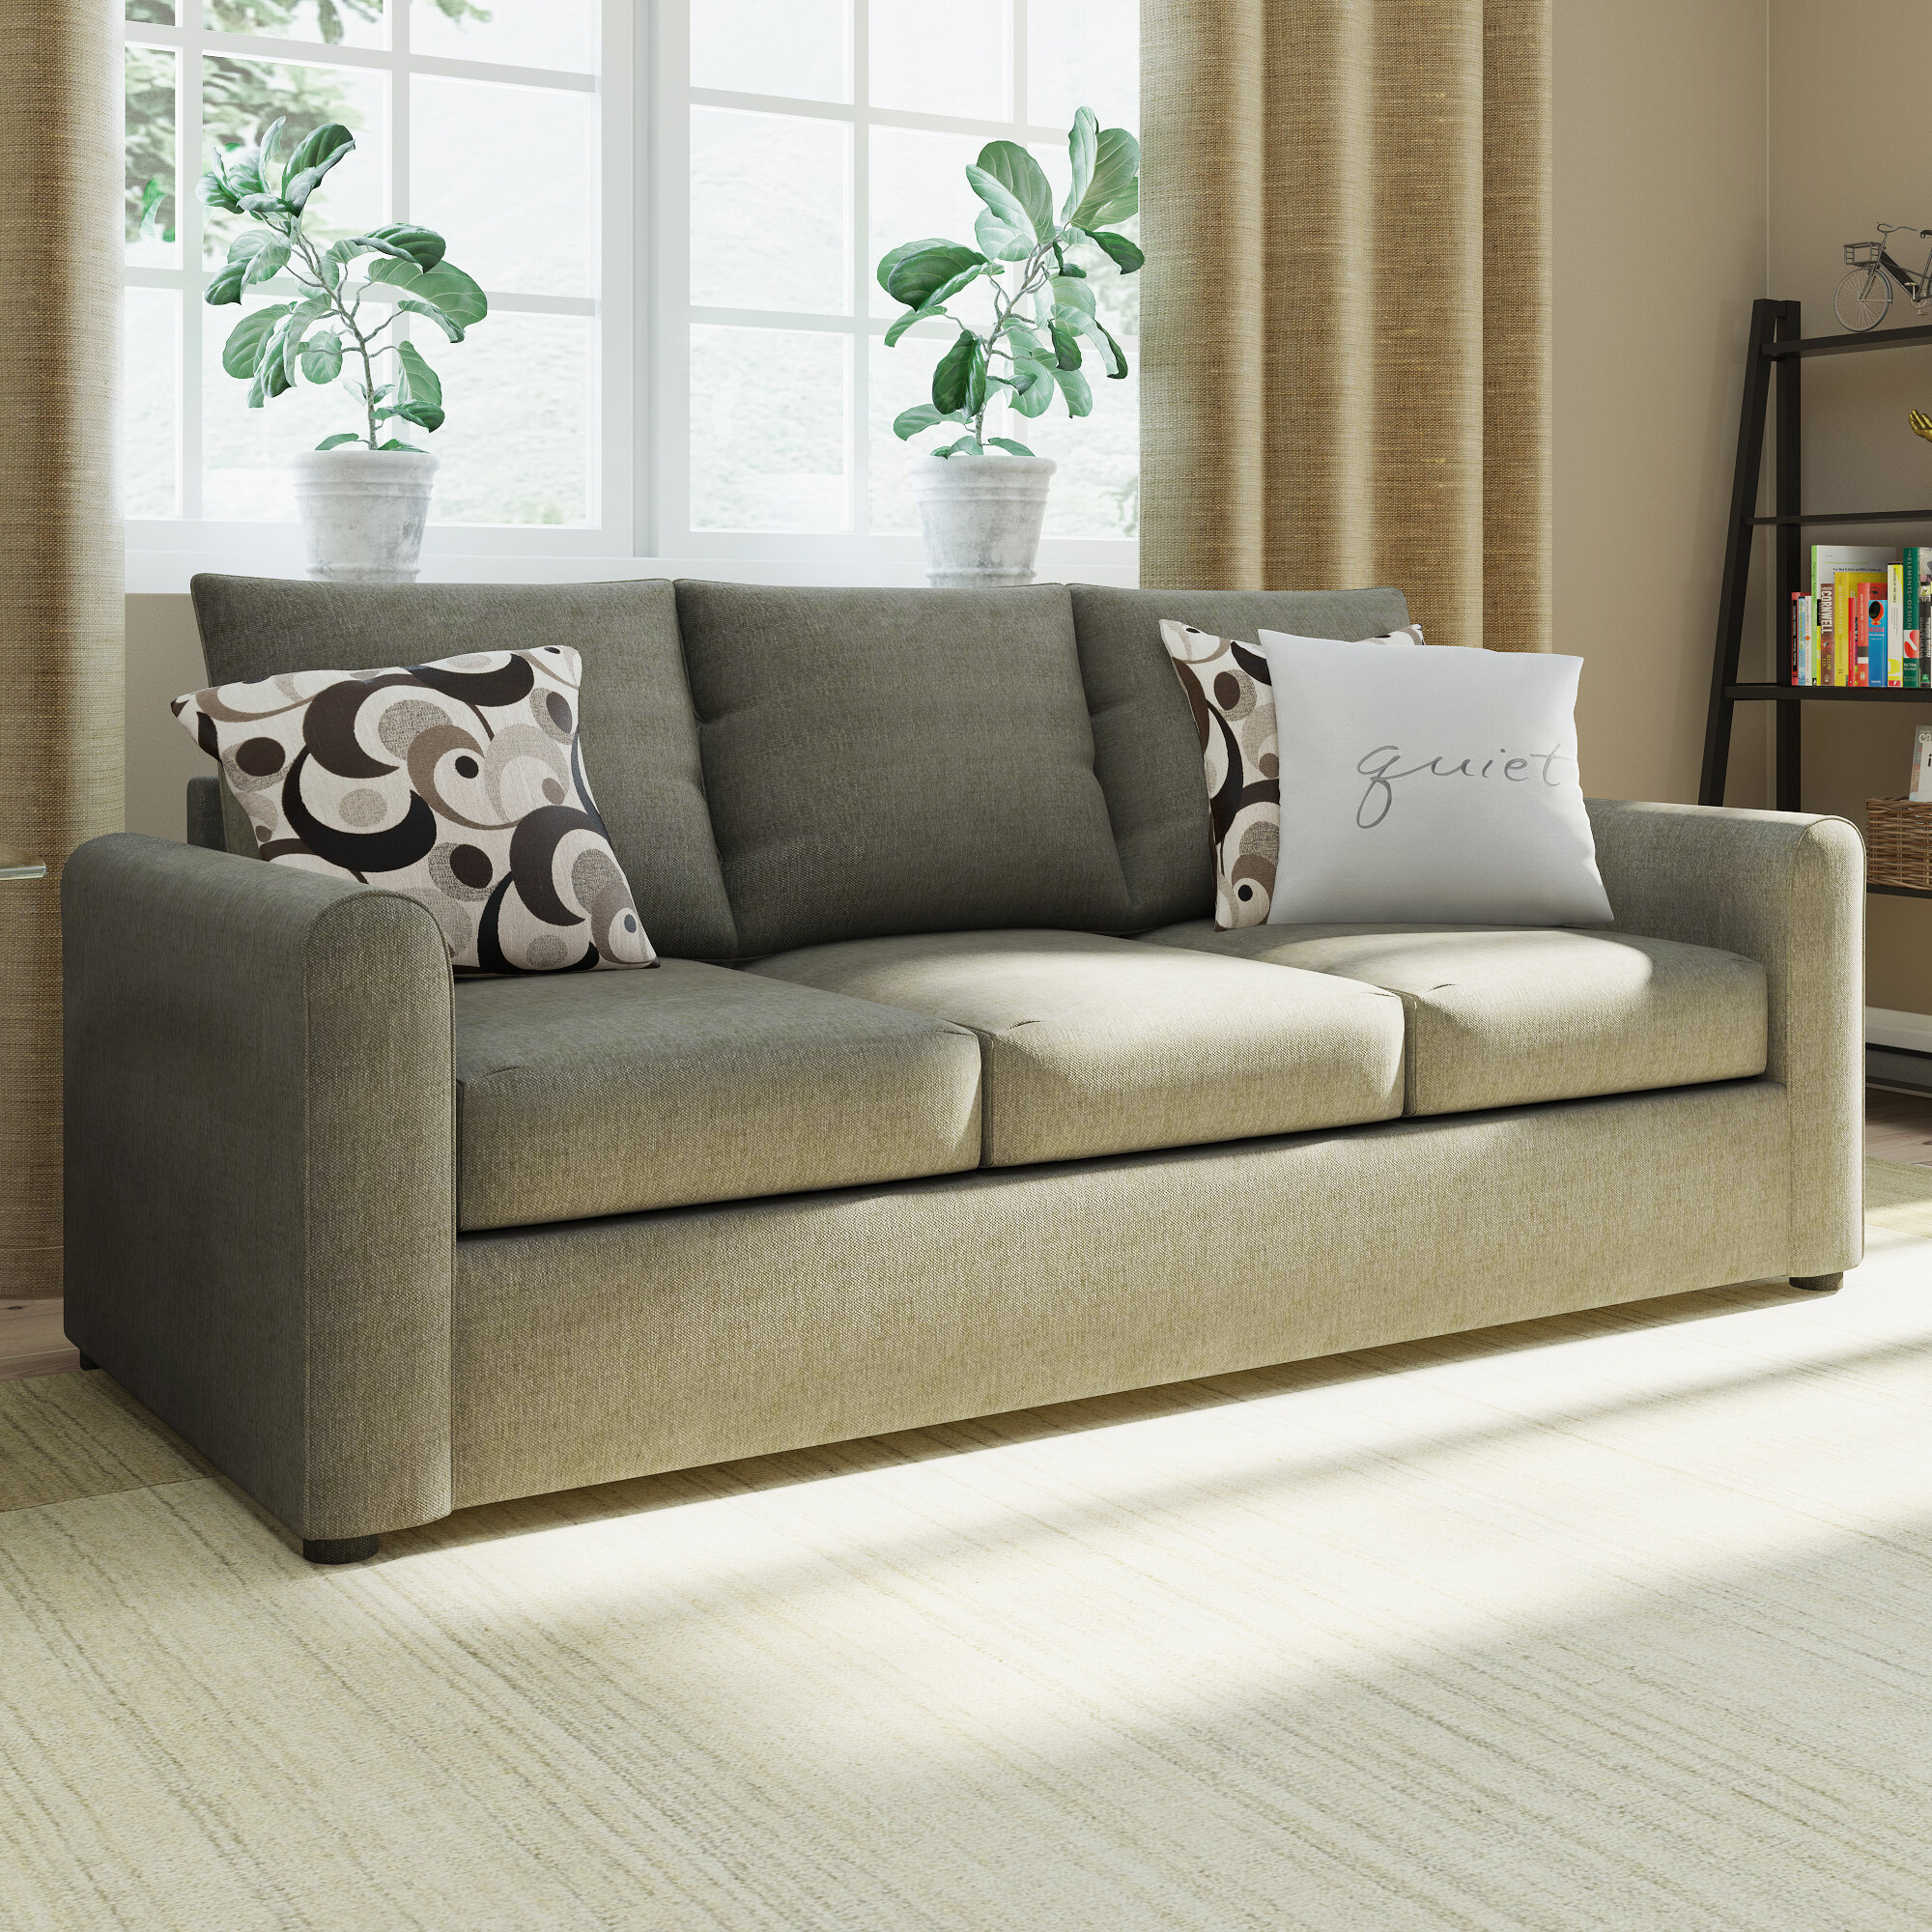 Red Barrel Studio Serta Upholstery Martin House Modern Sleeper Sofa U0026  Reviews | Wayfair